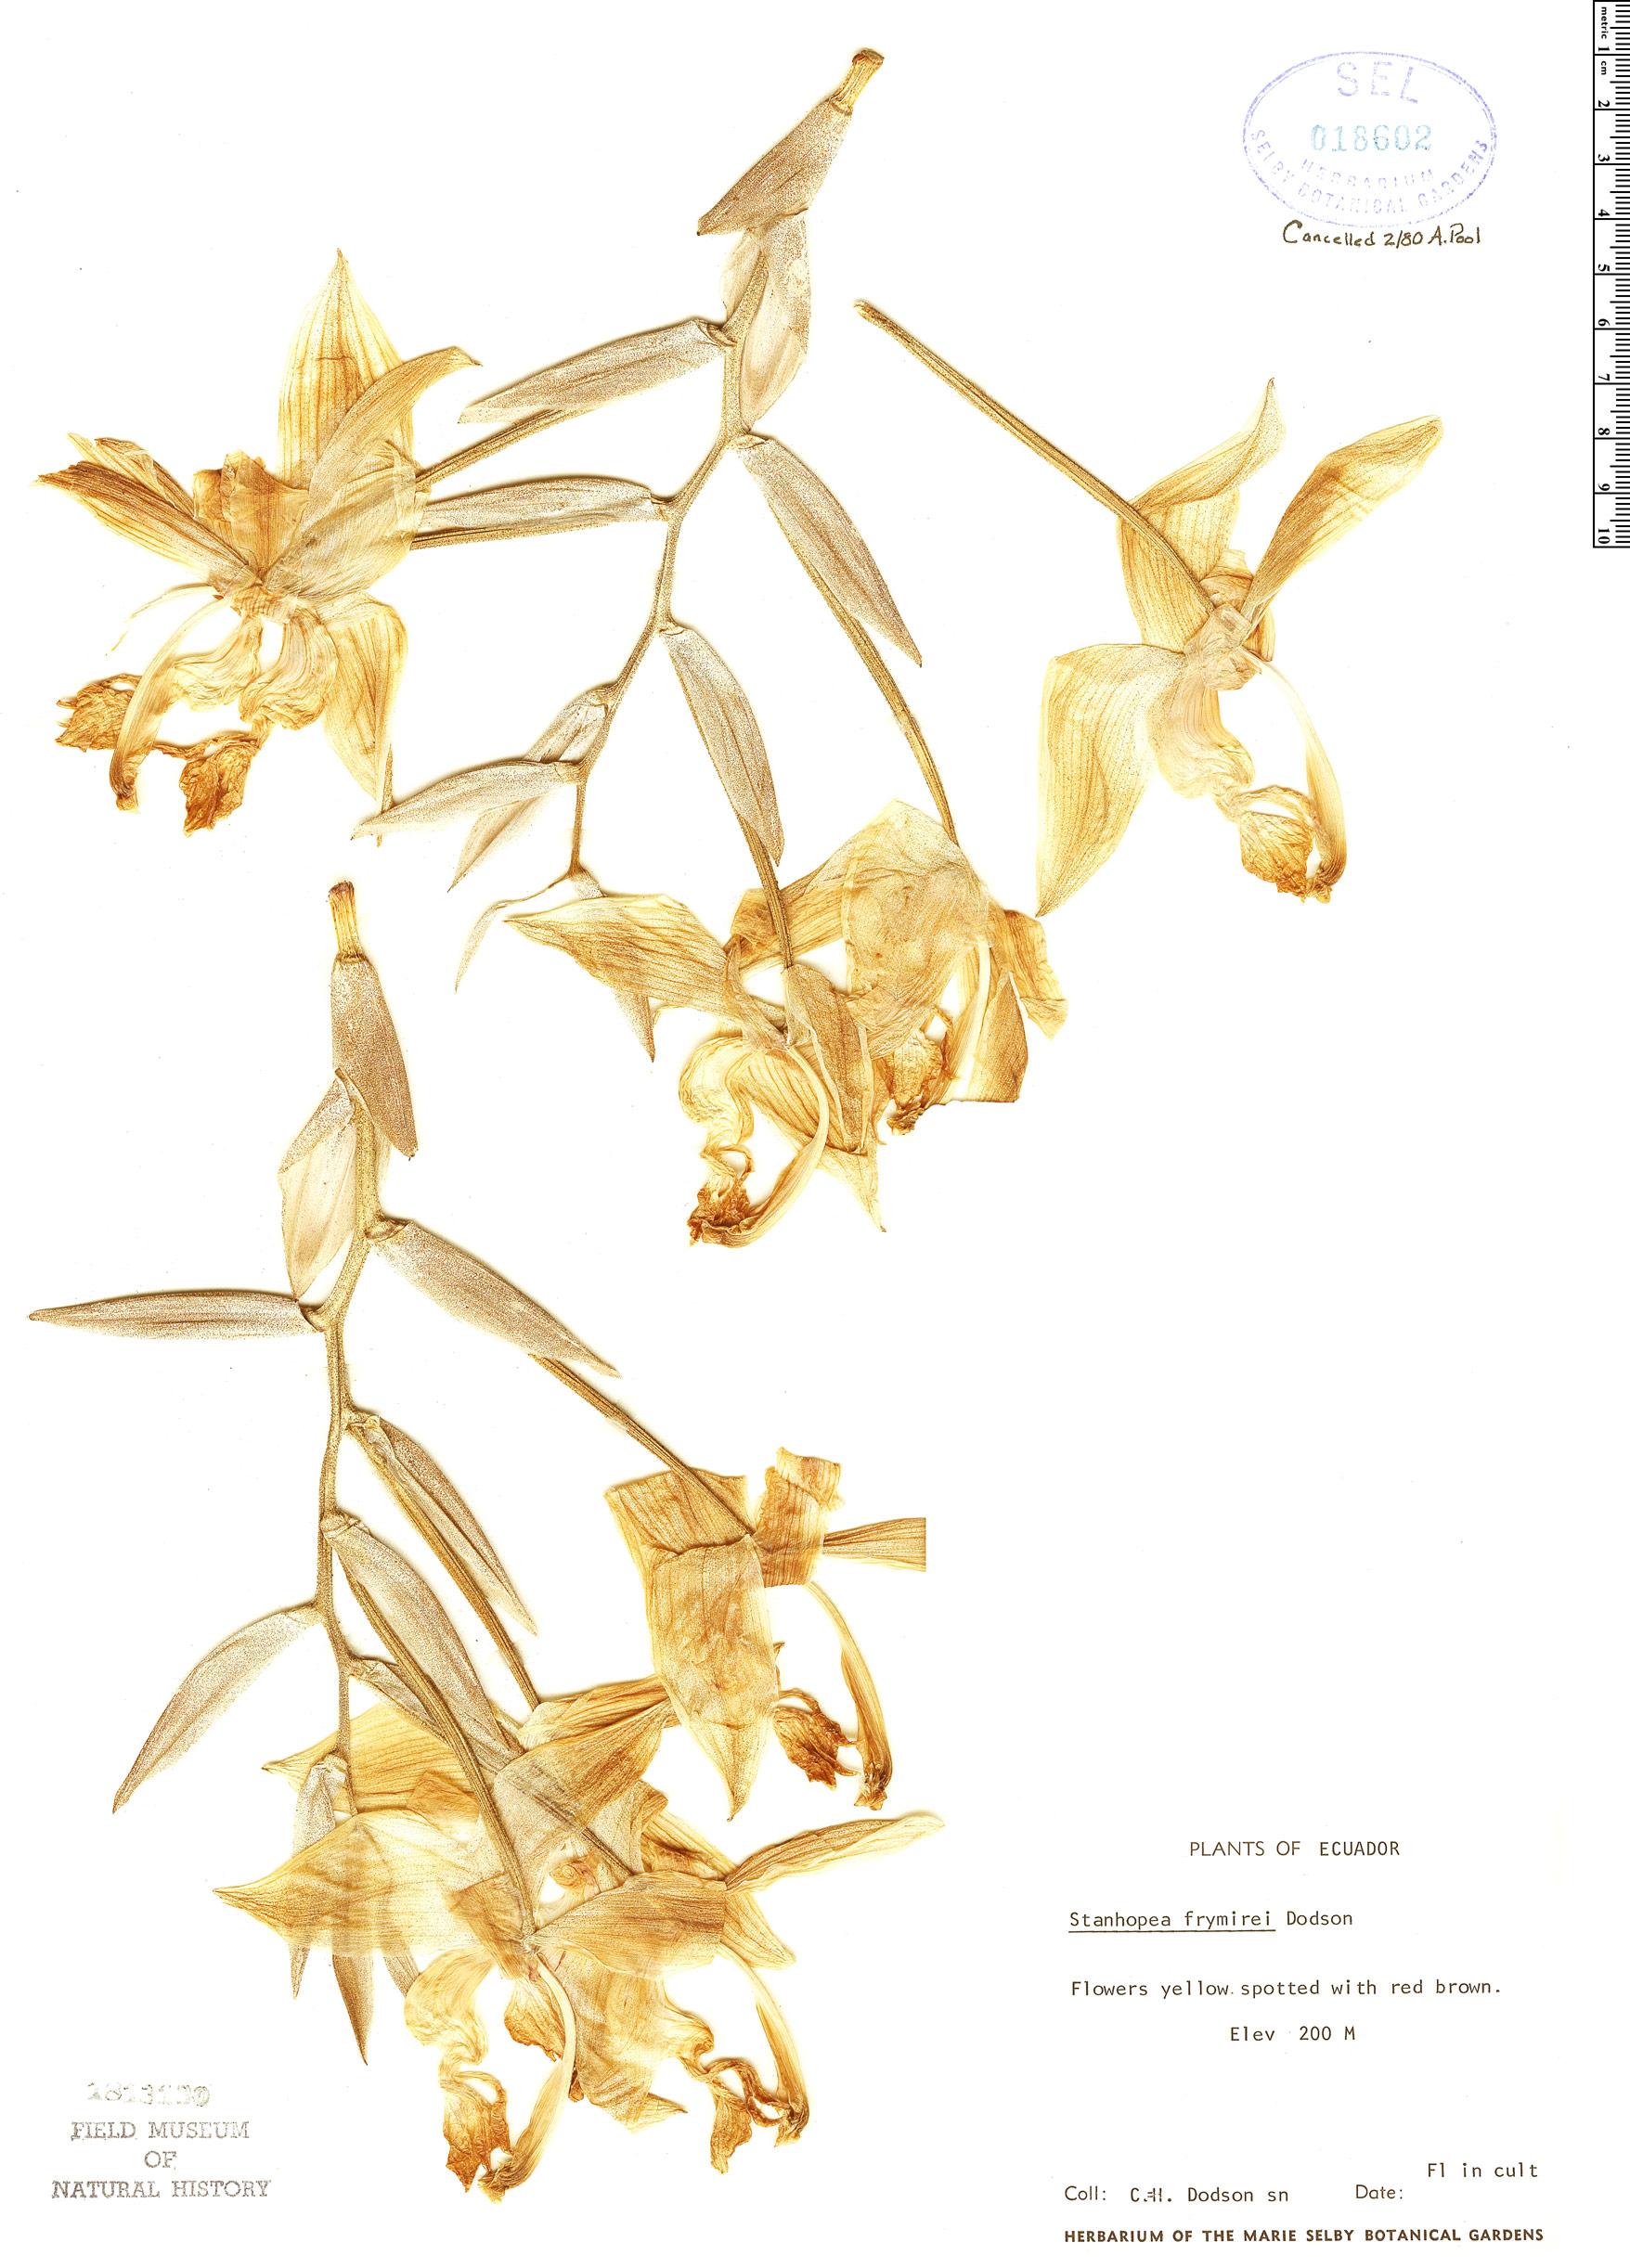 Specimen: Stanhopea frymirei